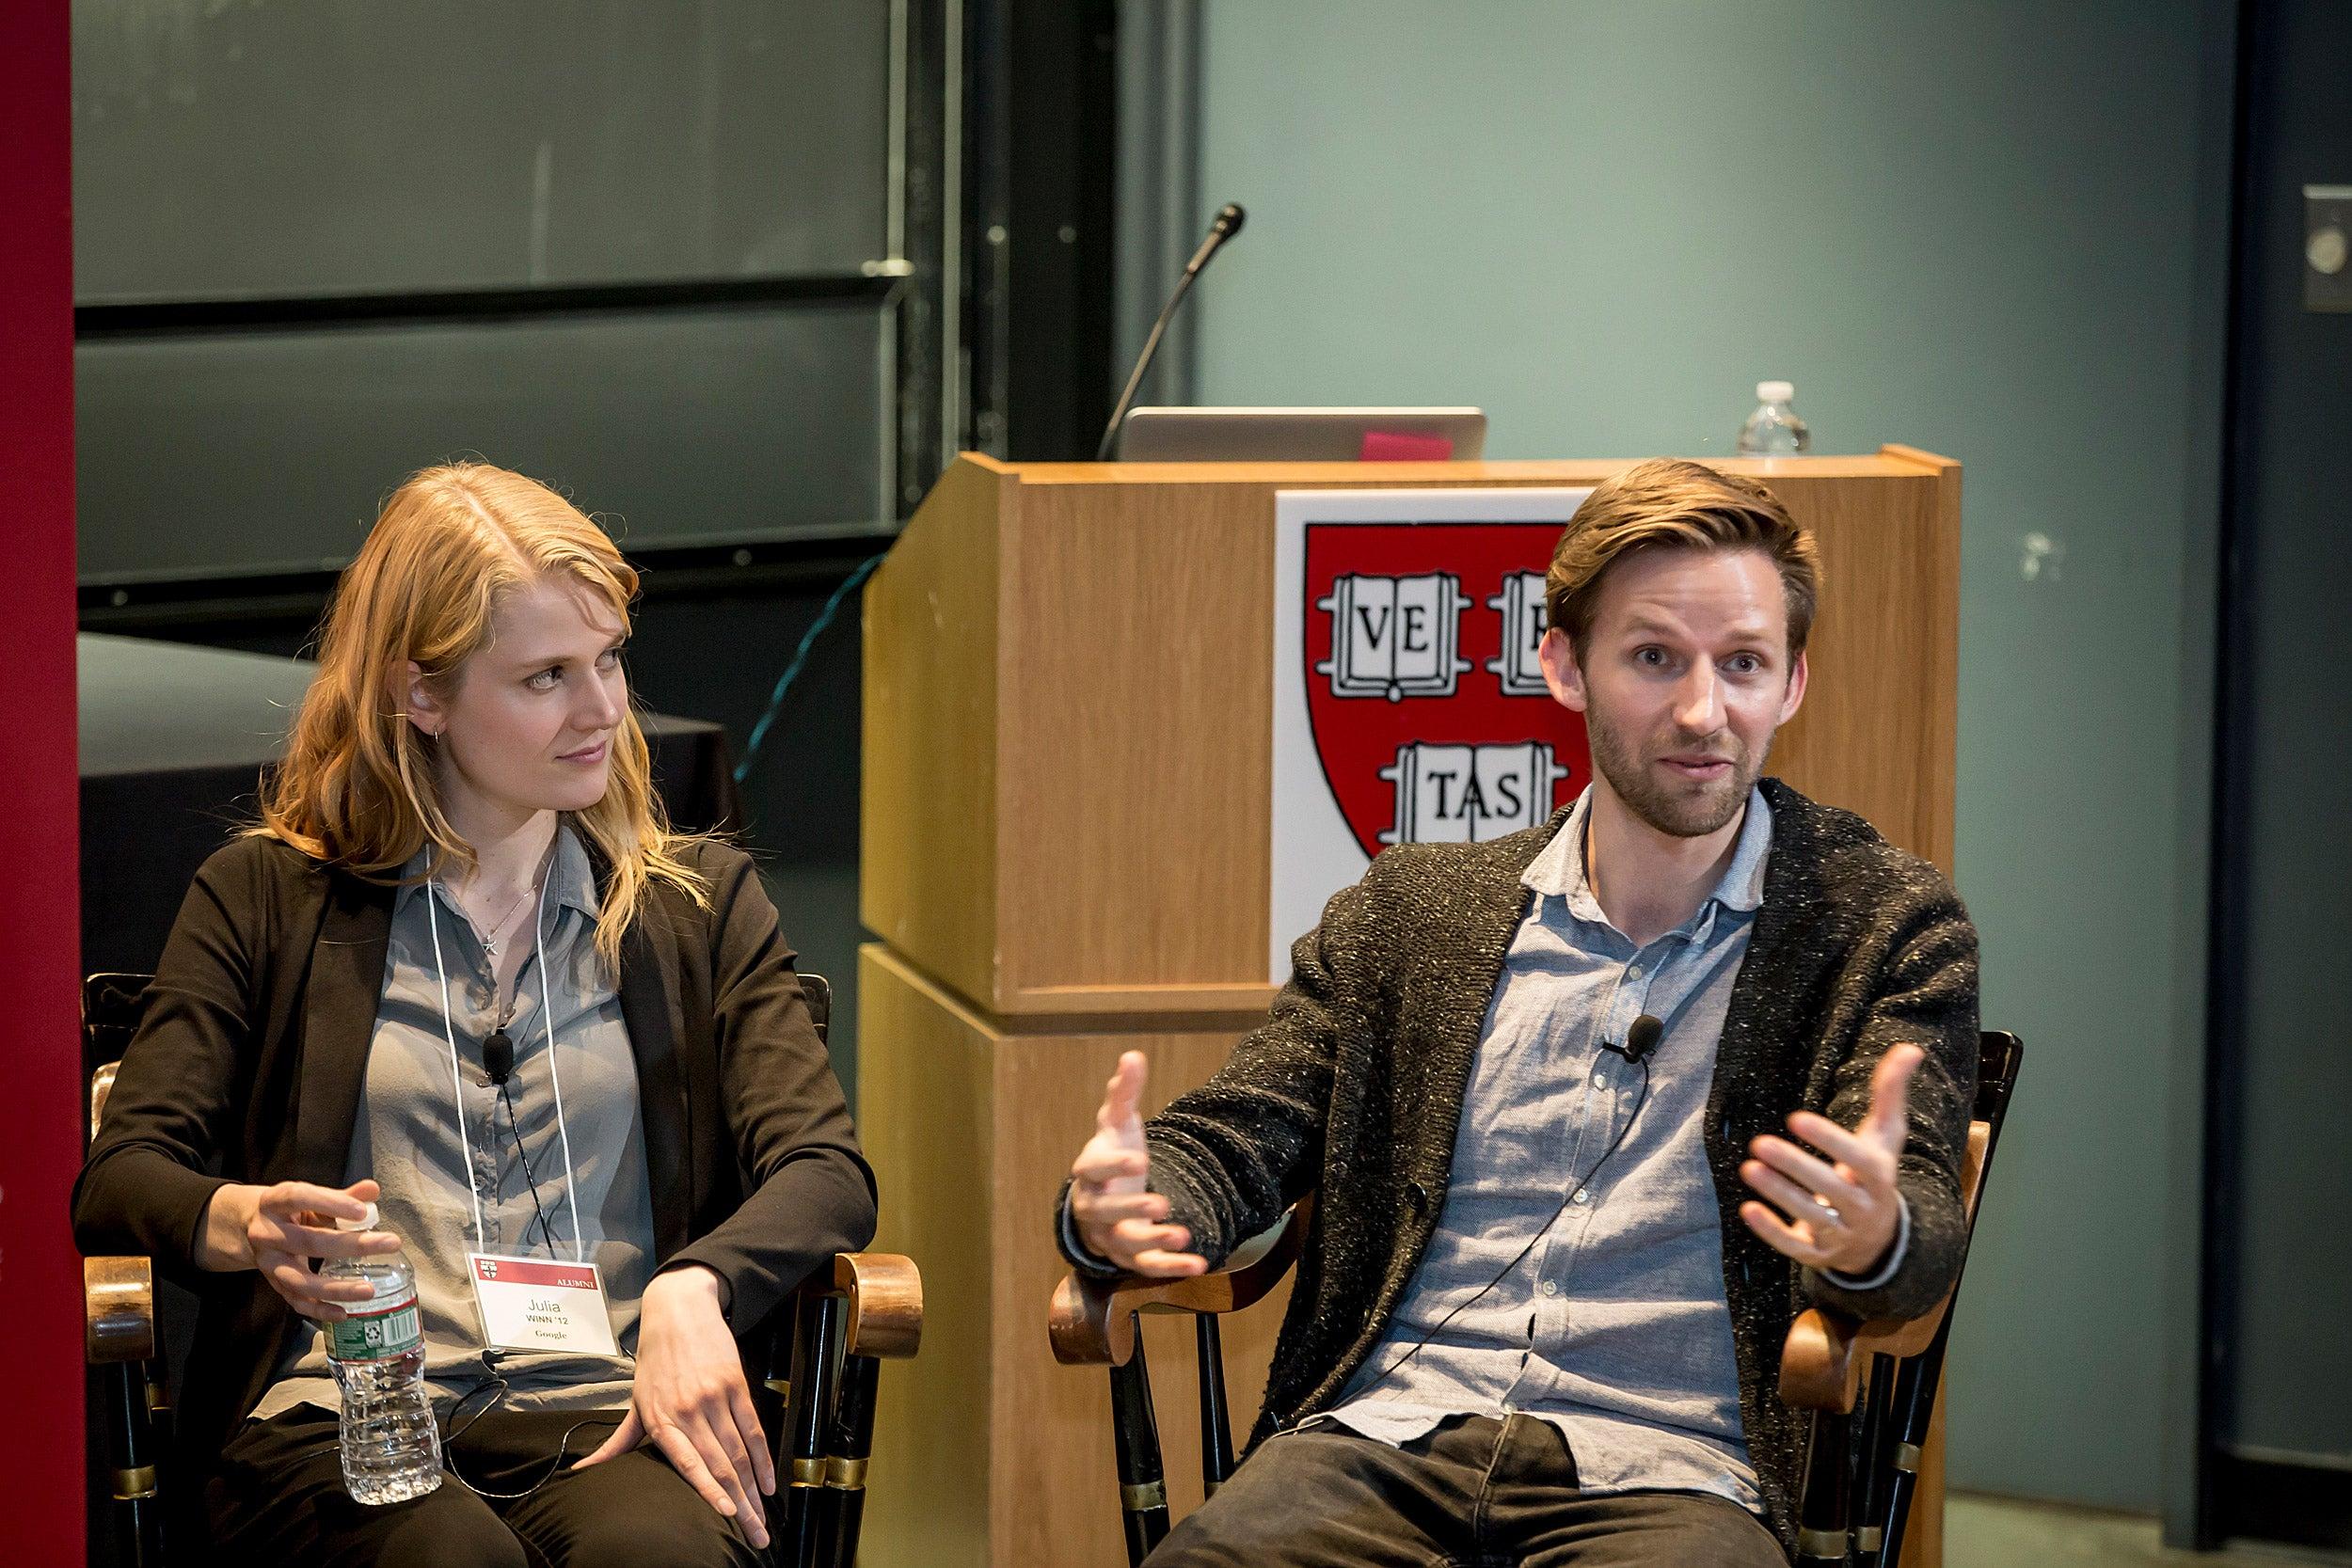 ulia Winn, '12 (pictured, left) and Daniel Nevius, '11